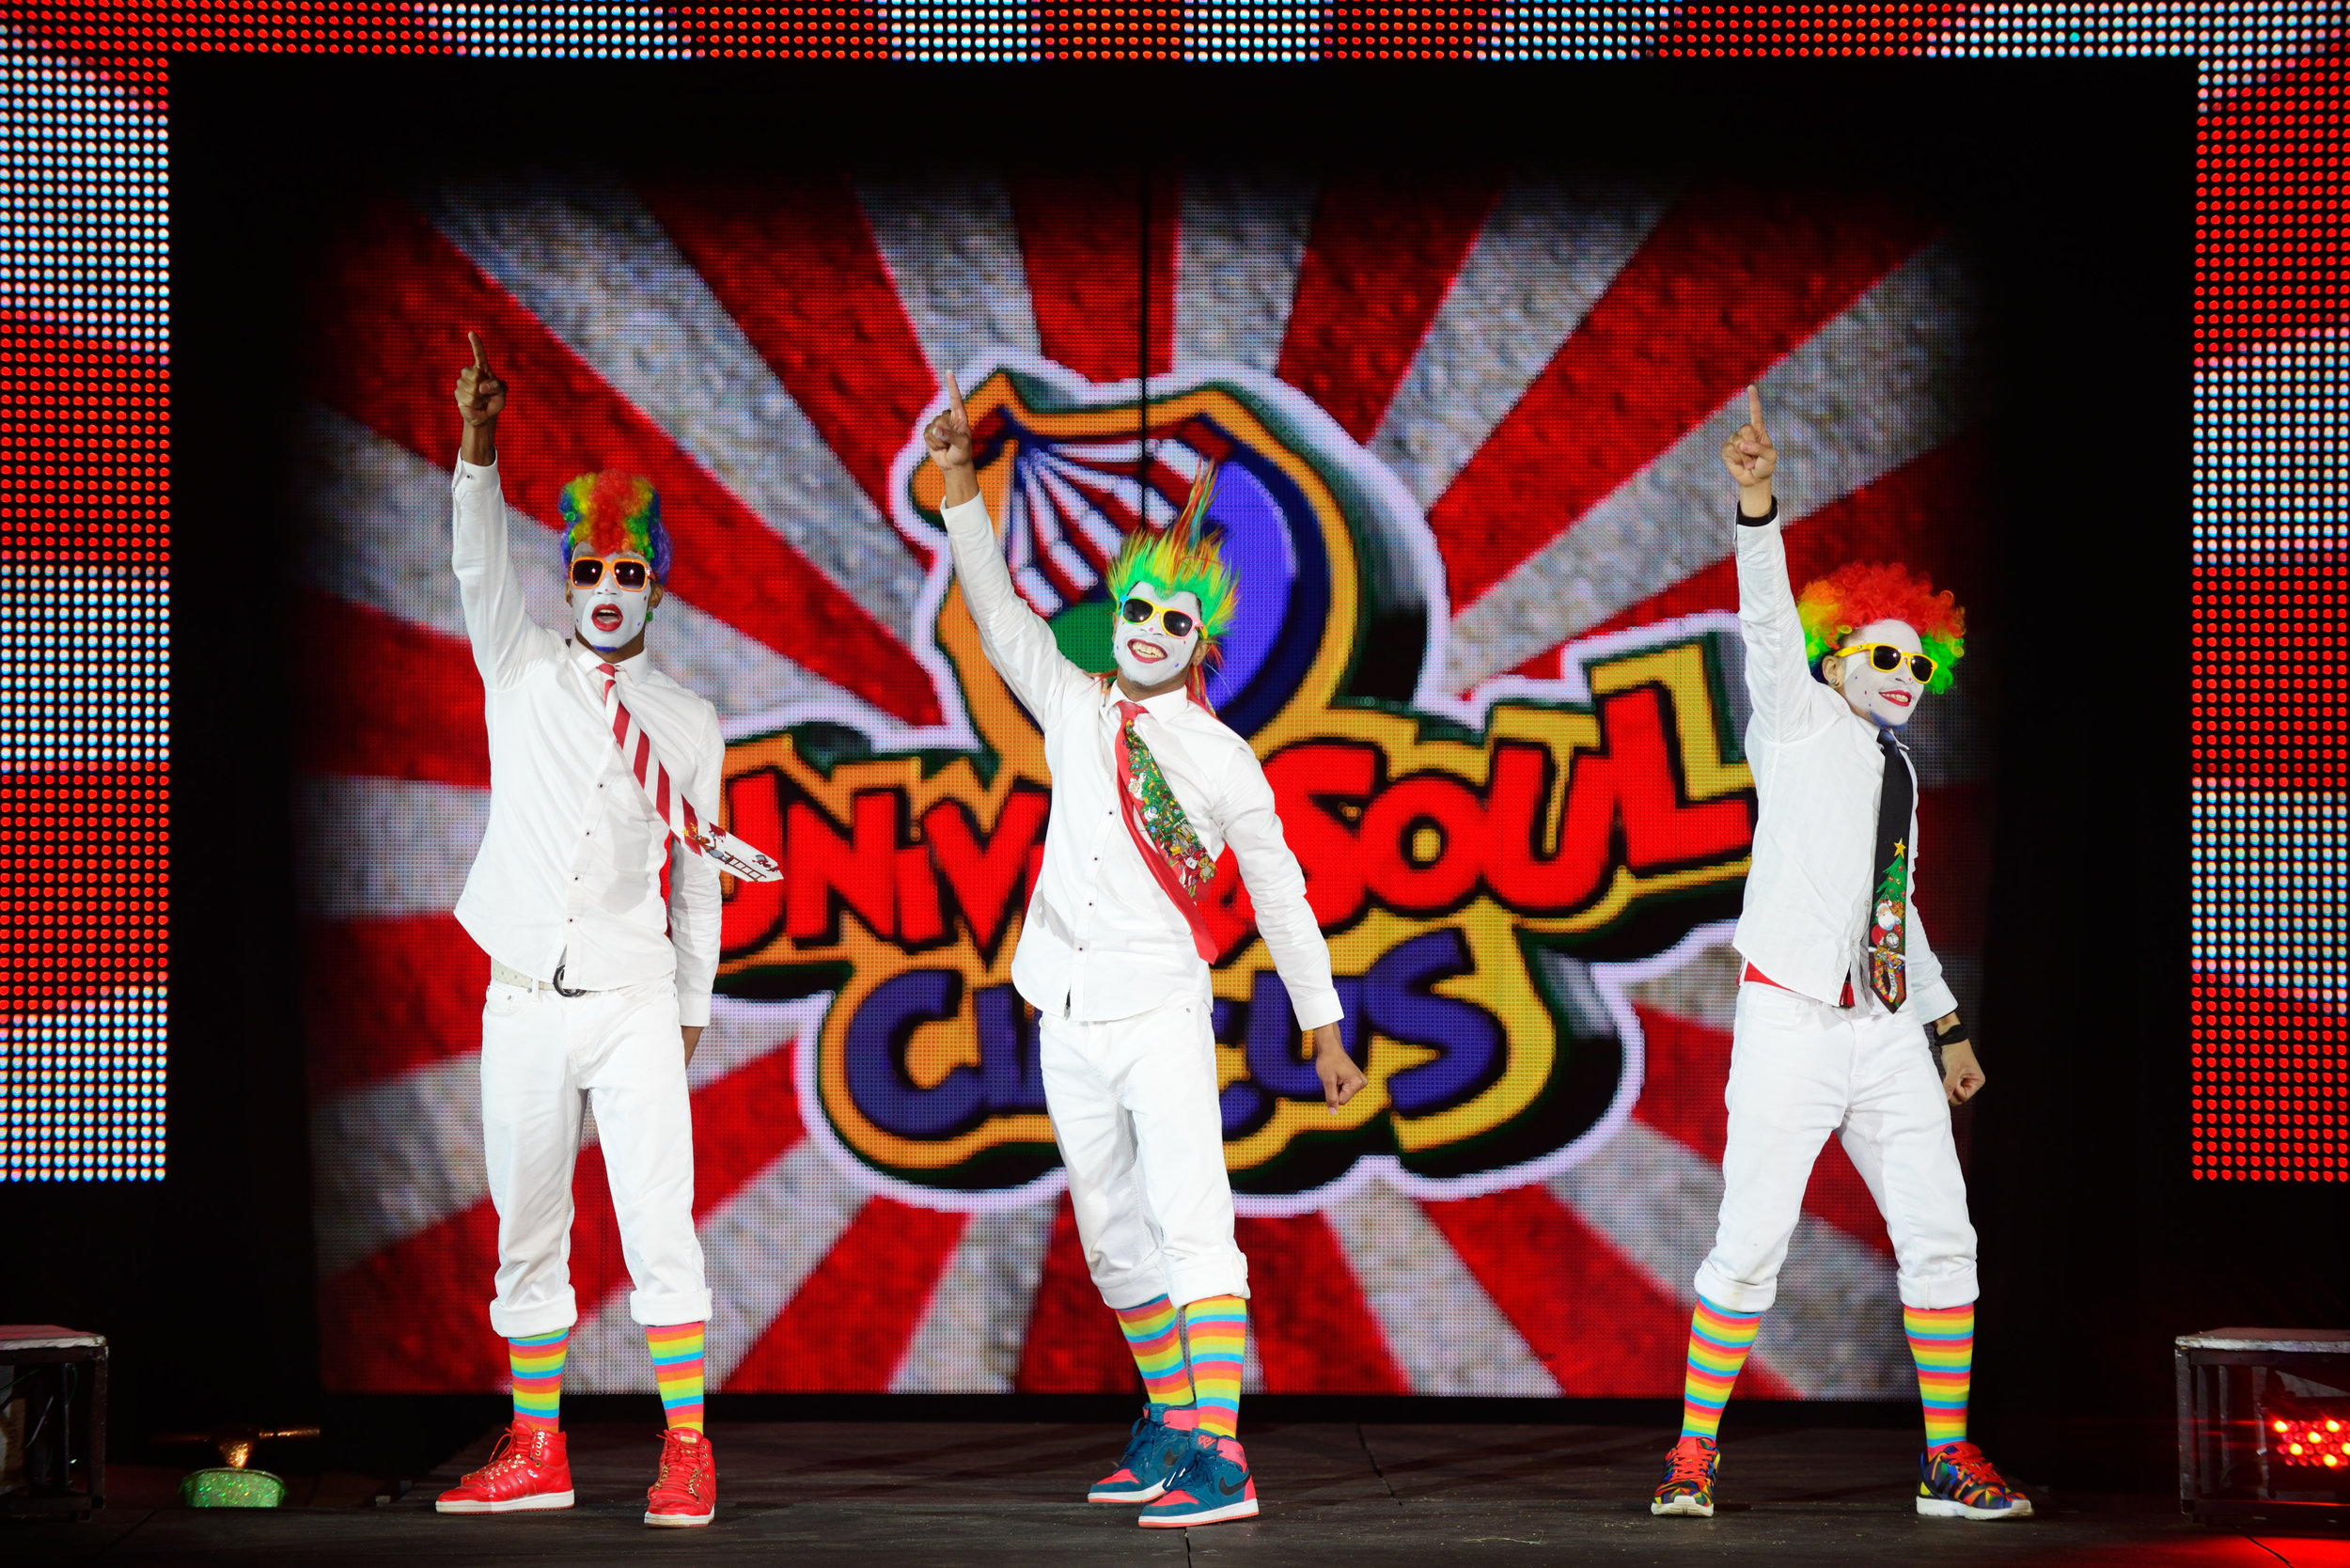 Universoul Circus, Circus Arts, Clowns